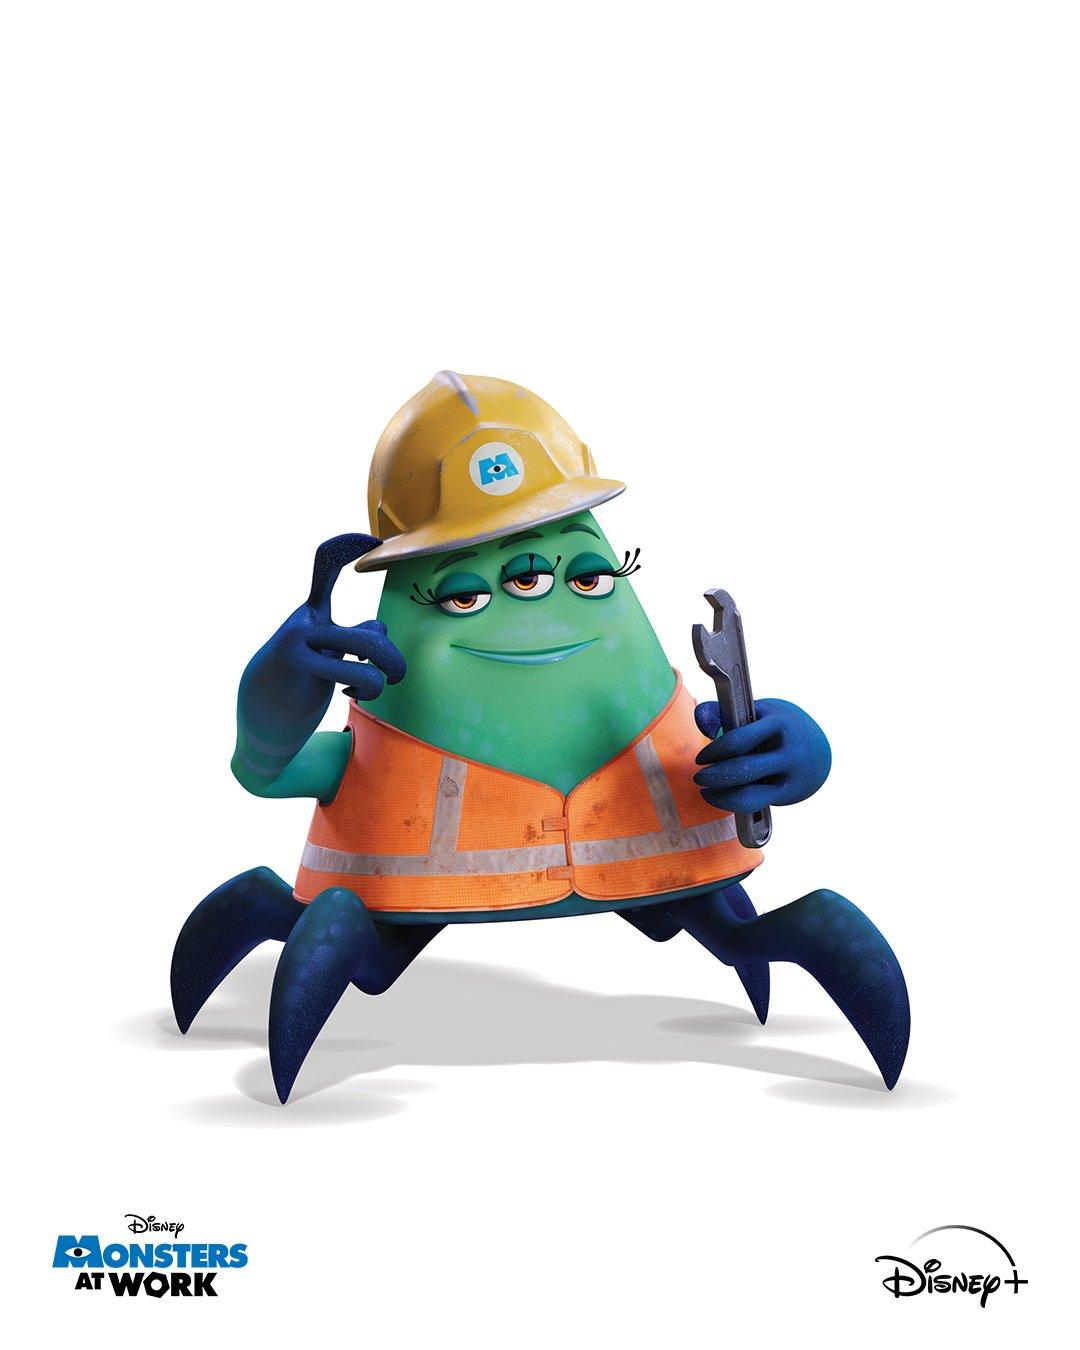 Monstres & Cie : Au Travail [Disney Television - 2020] EwsXVtcVoAA6-ZR?format=jpg&name=large